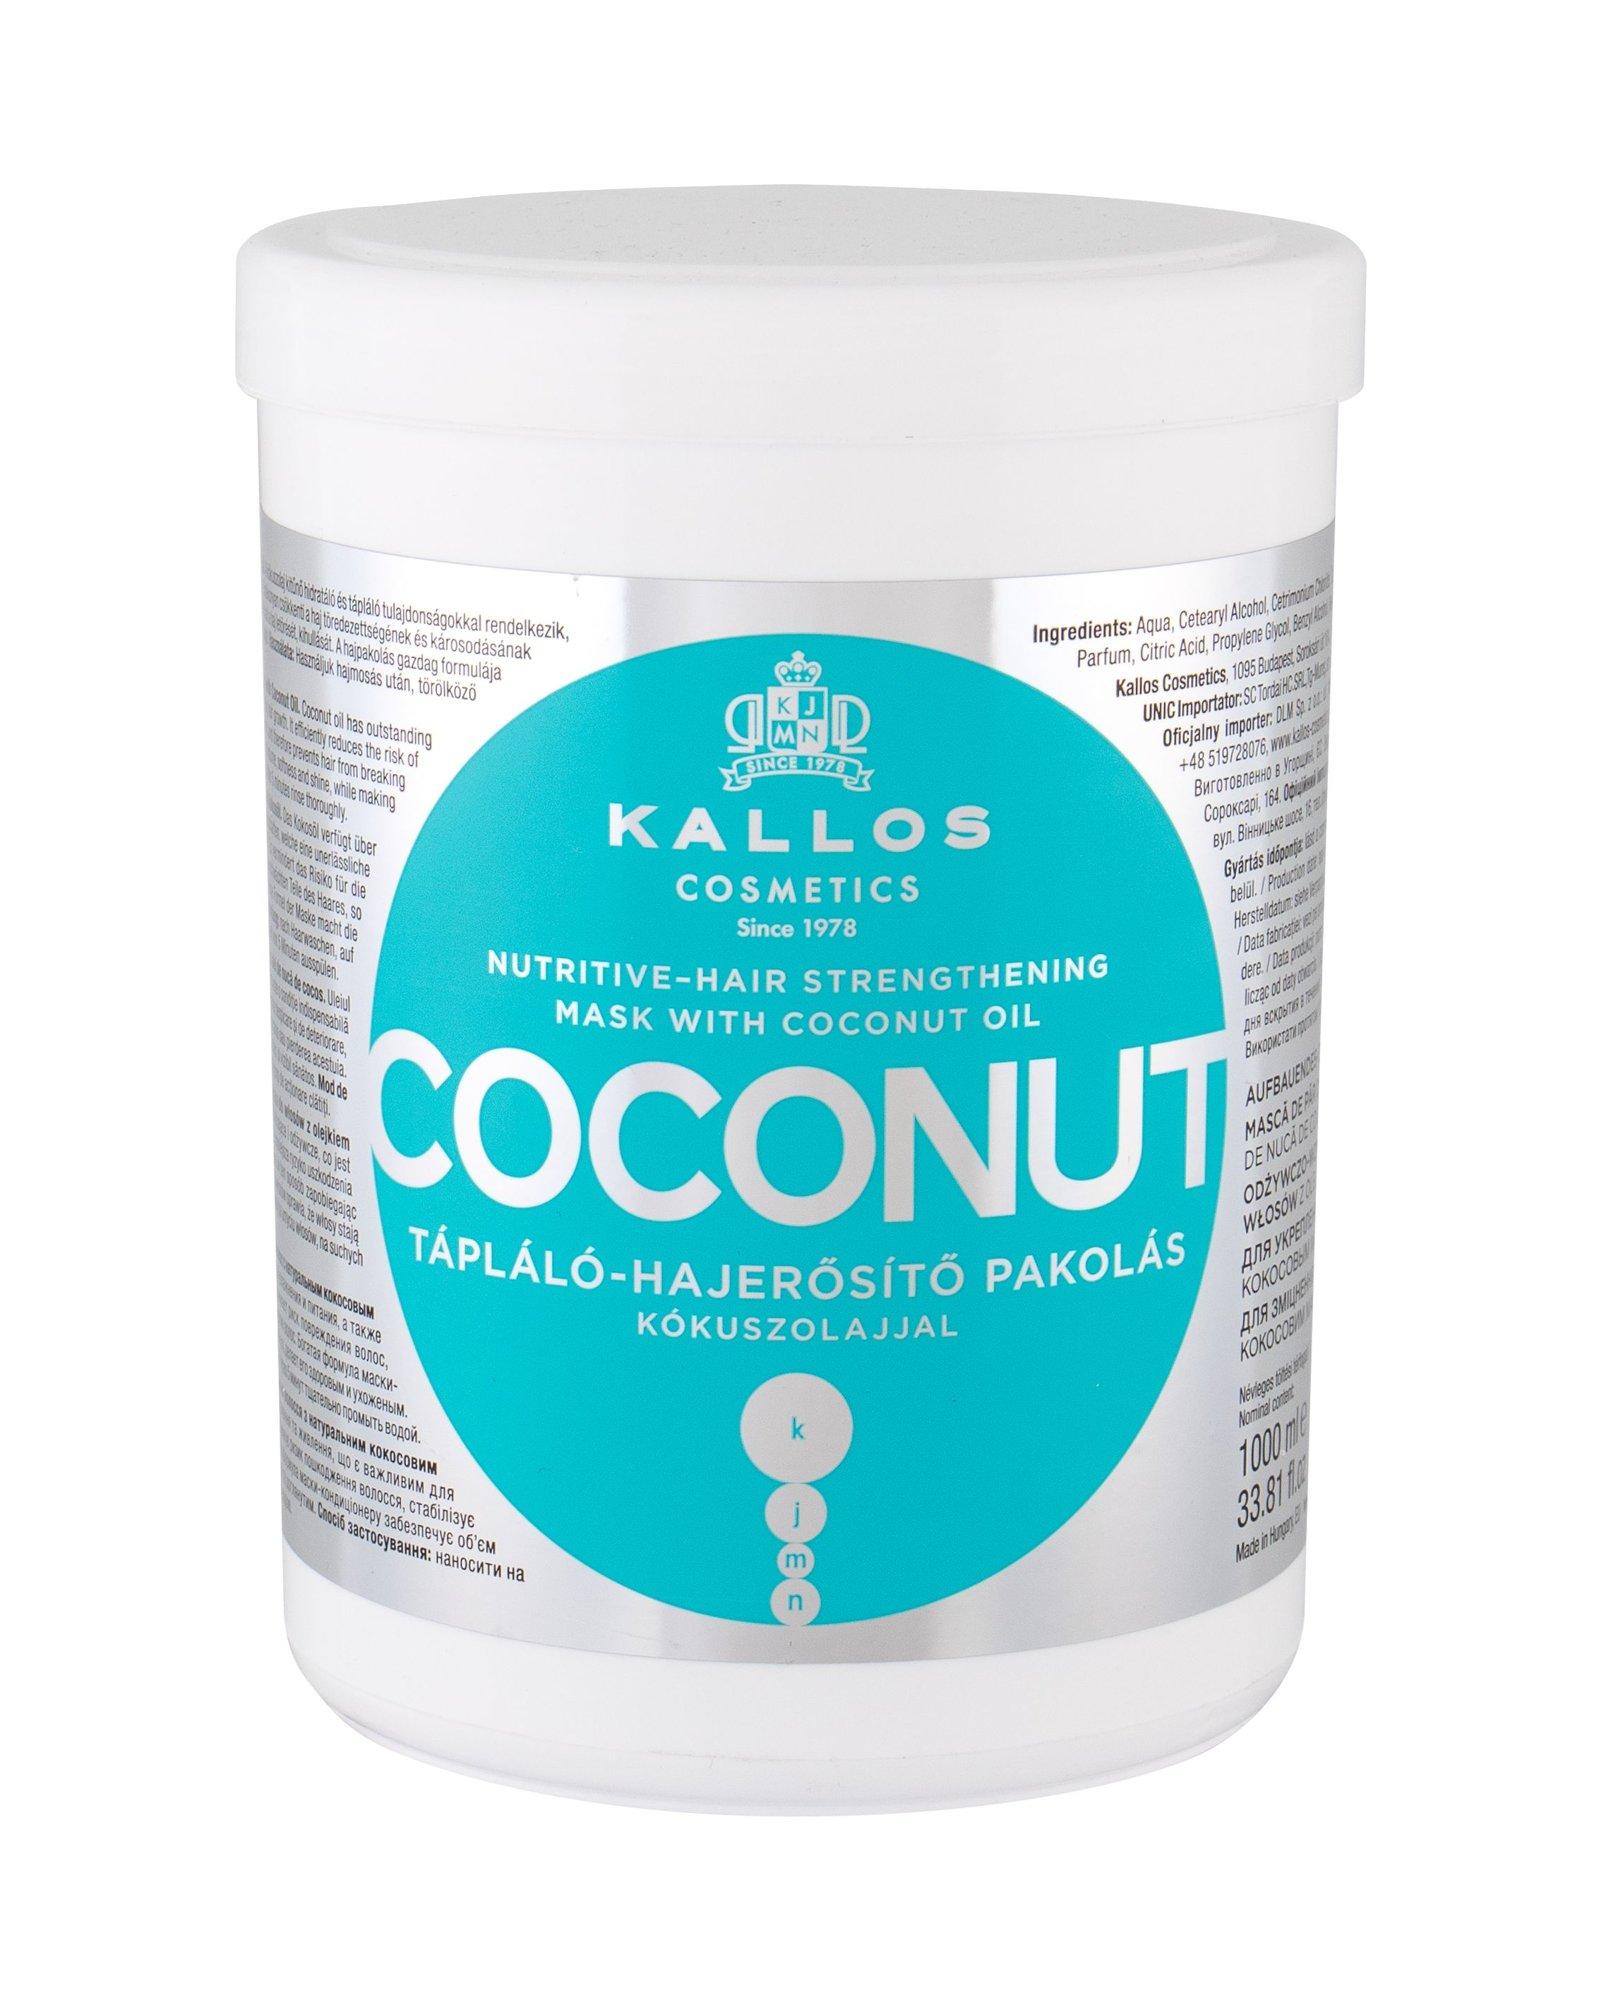 Kallos Cosmetics Coconut Hair Mask 1000ml